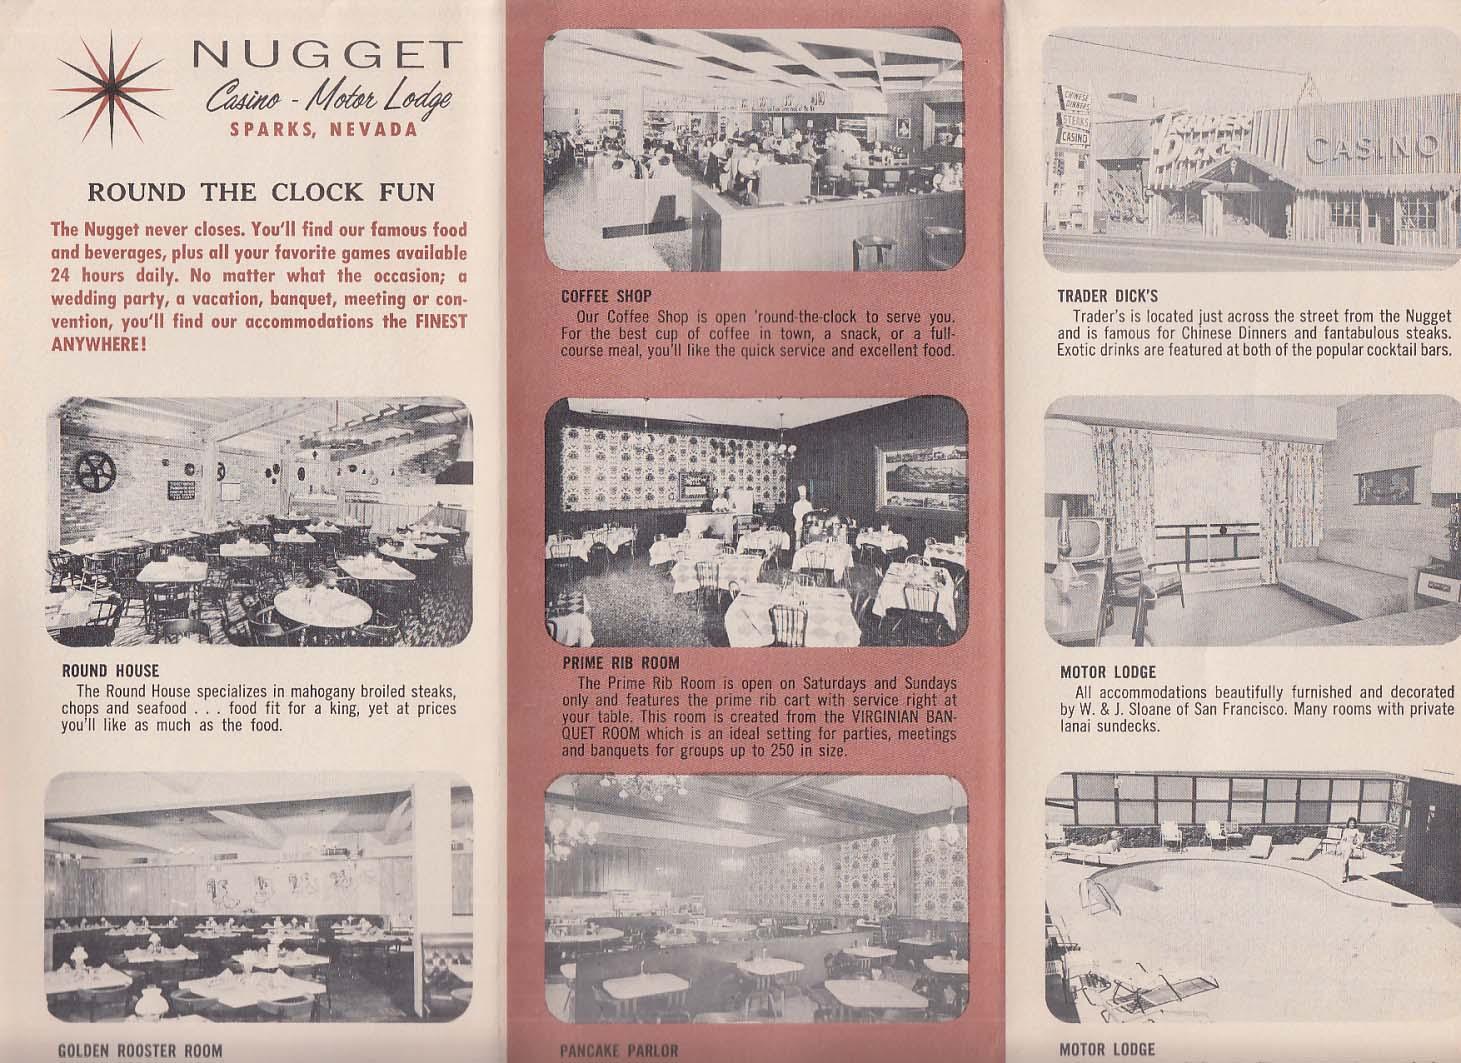 Nugget Casino-Motor Lodge Map of Reno & Sparks NV ca 1959